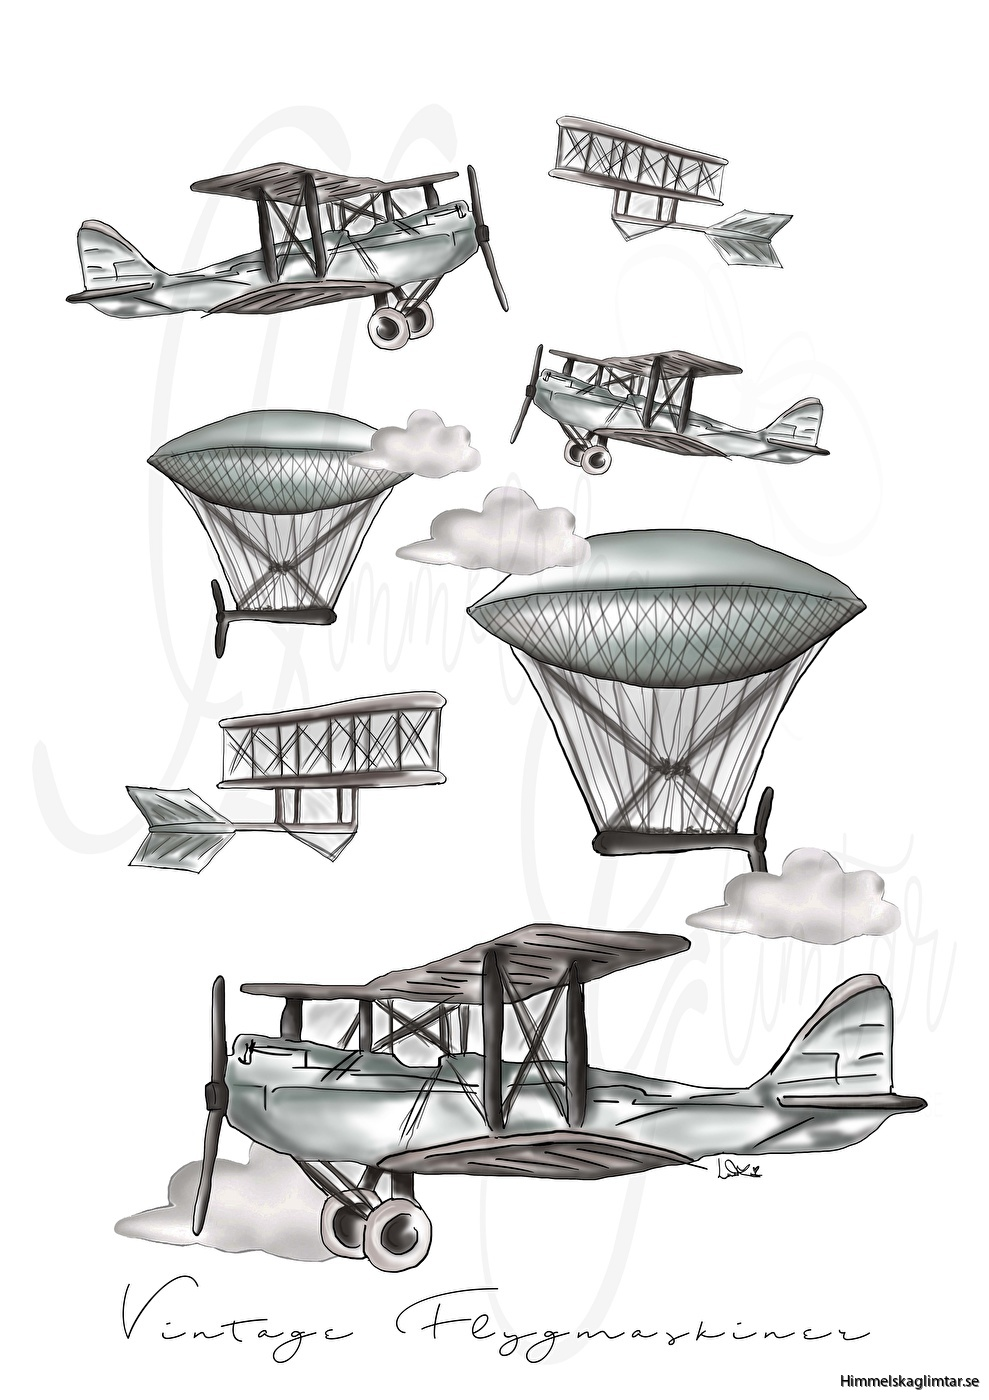 vintage flygmaskiner-himmelskaglimtar-barnrum-barnposter-interior-inredning